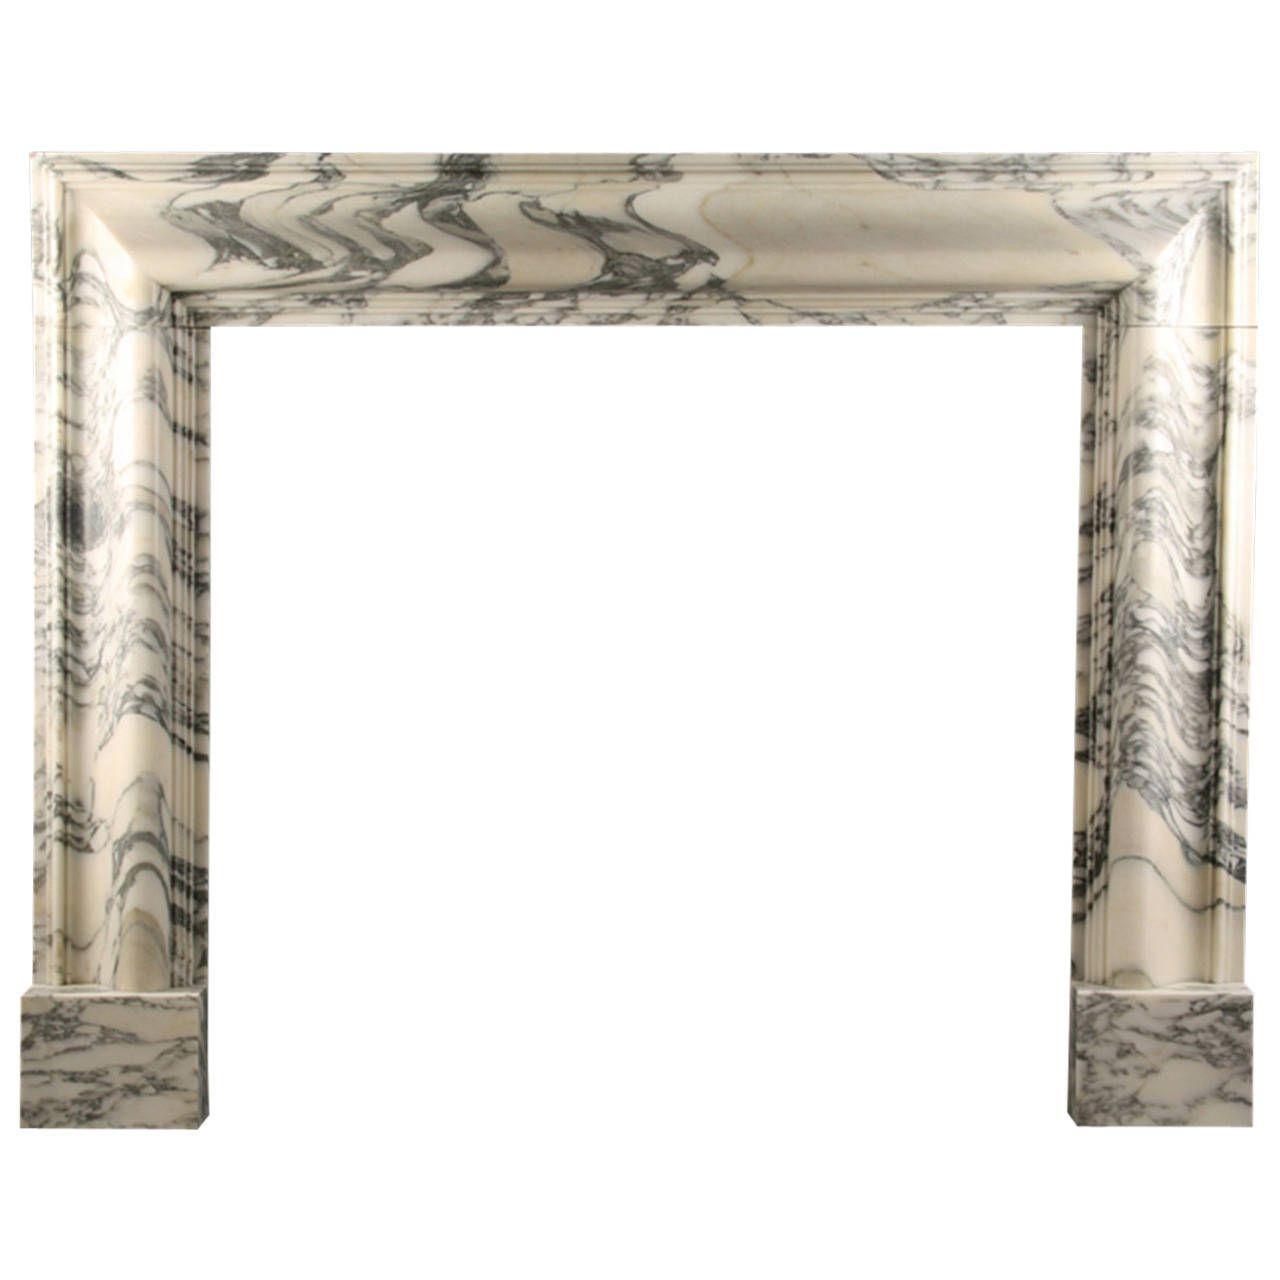 Baroque Bolection Fireplace In Italian Arabescato Marble Marble Fireplace Mantle Marble Fireplaces Arabescato Marble